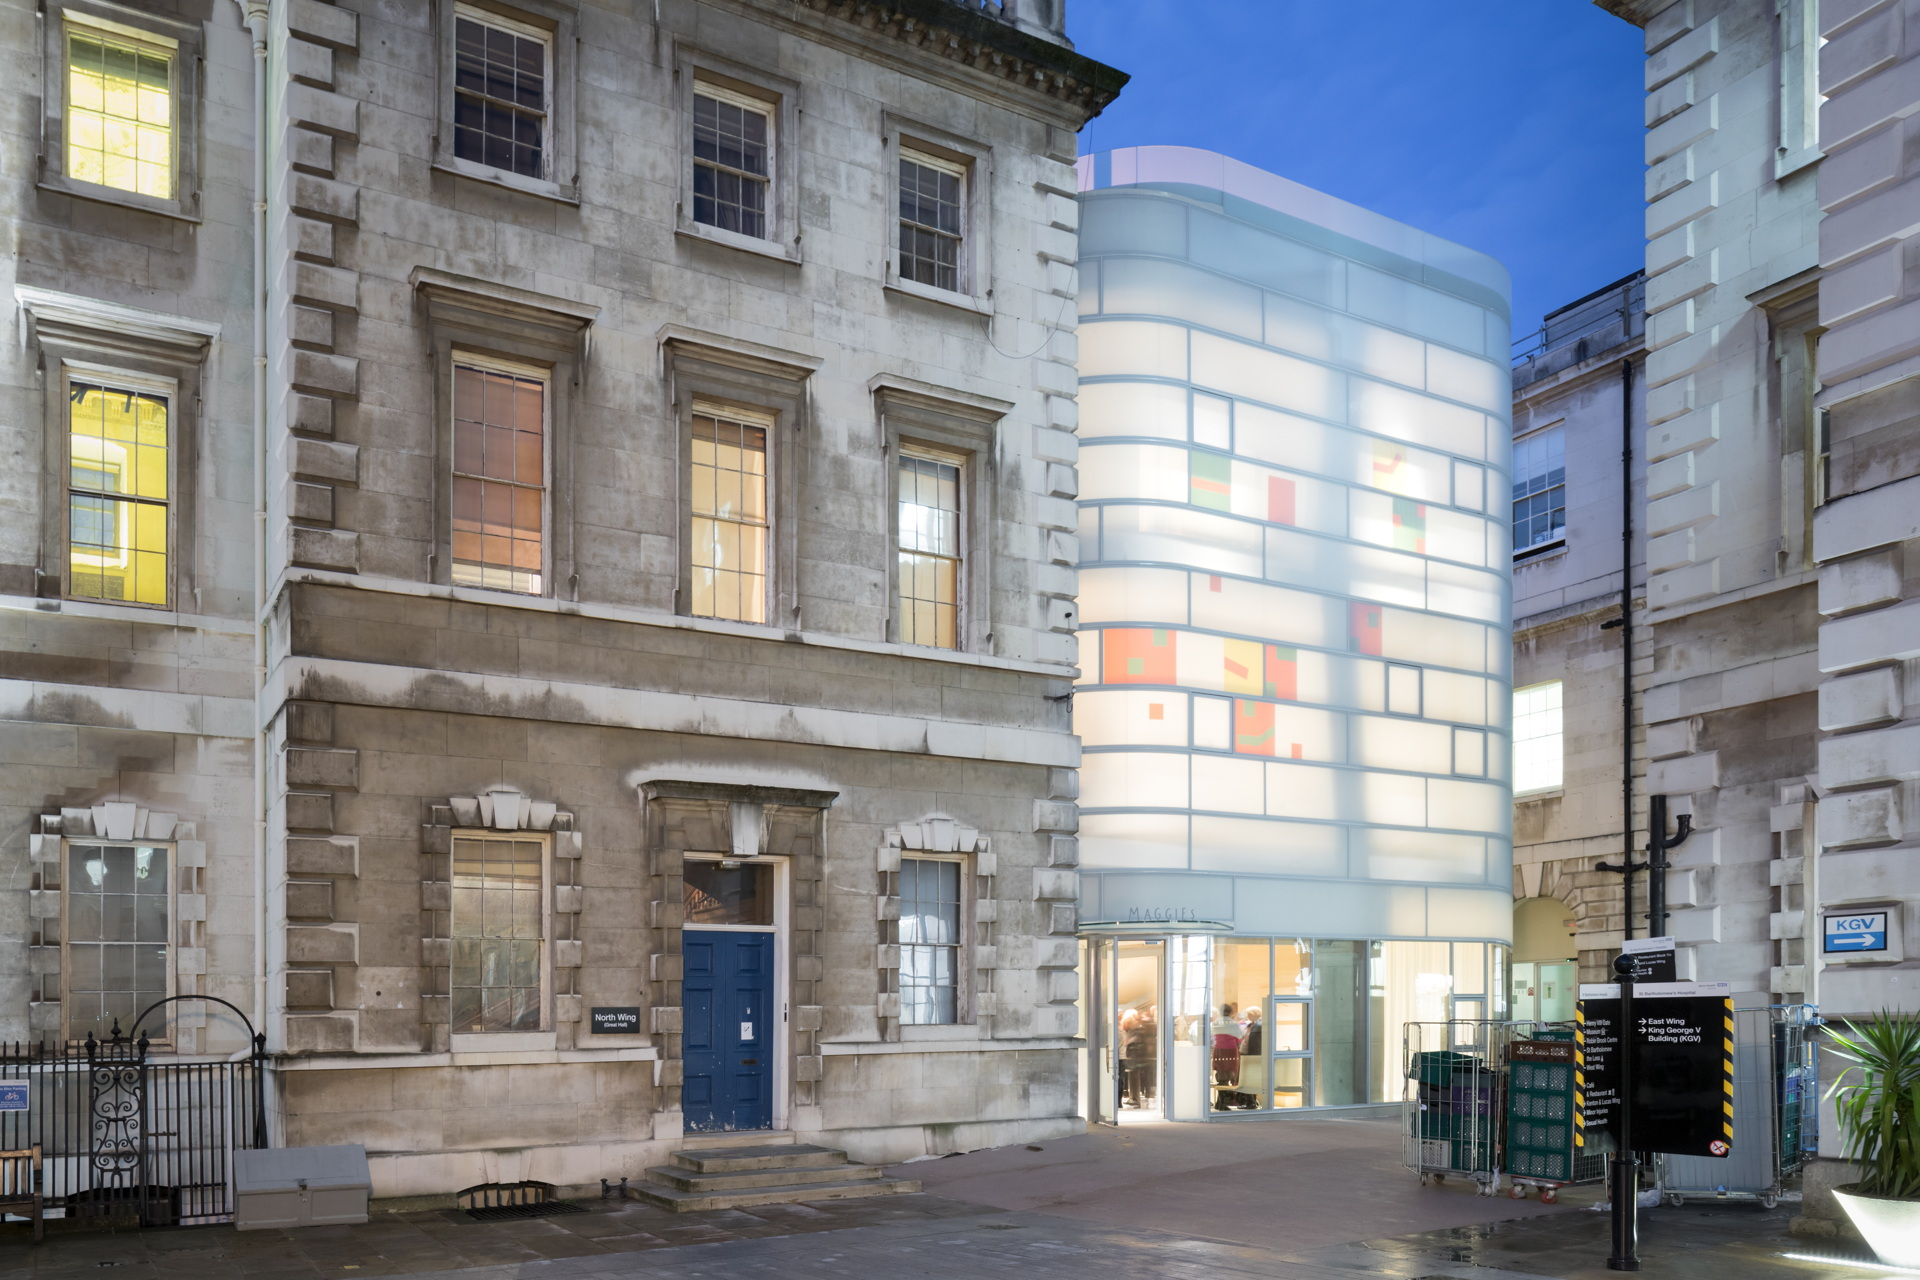 Steven Holl + jmarchitects: Maggie's Centre Barts London